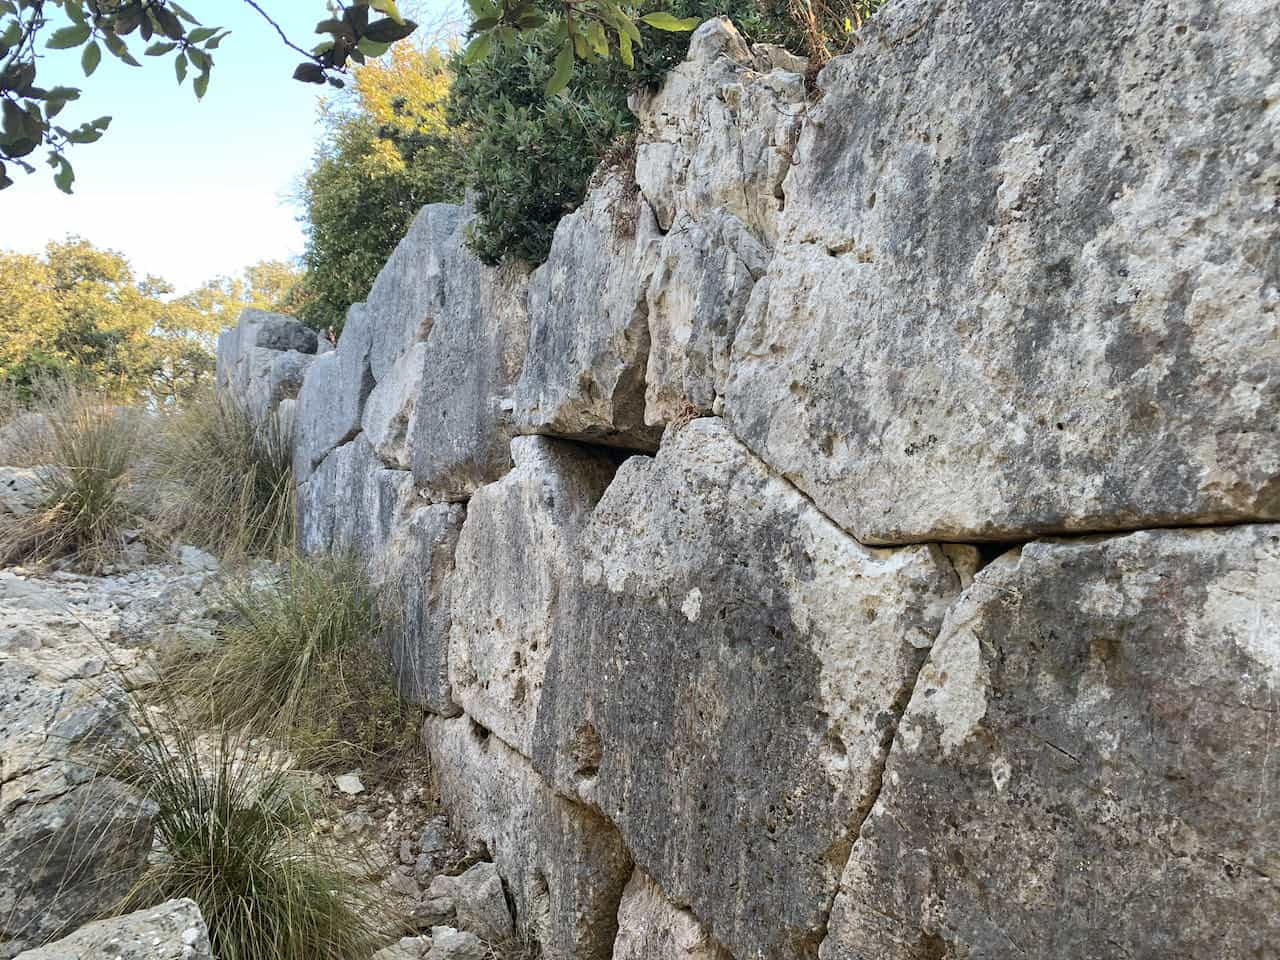 san felice Circeo Polygonall Wall